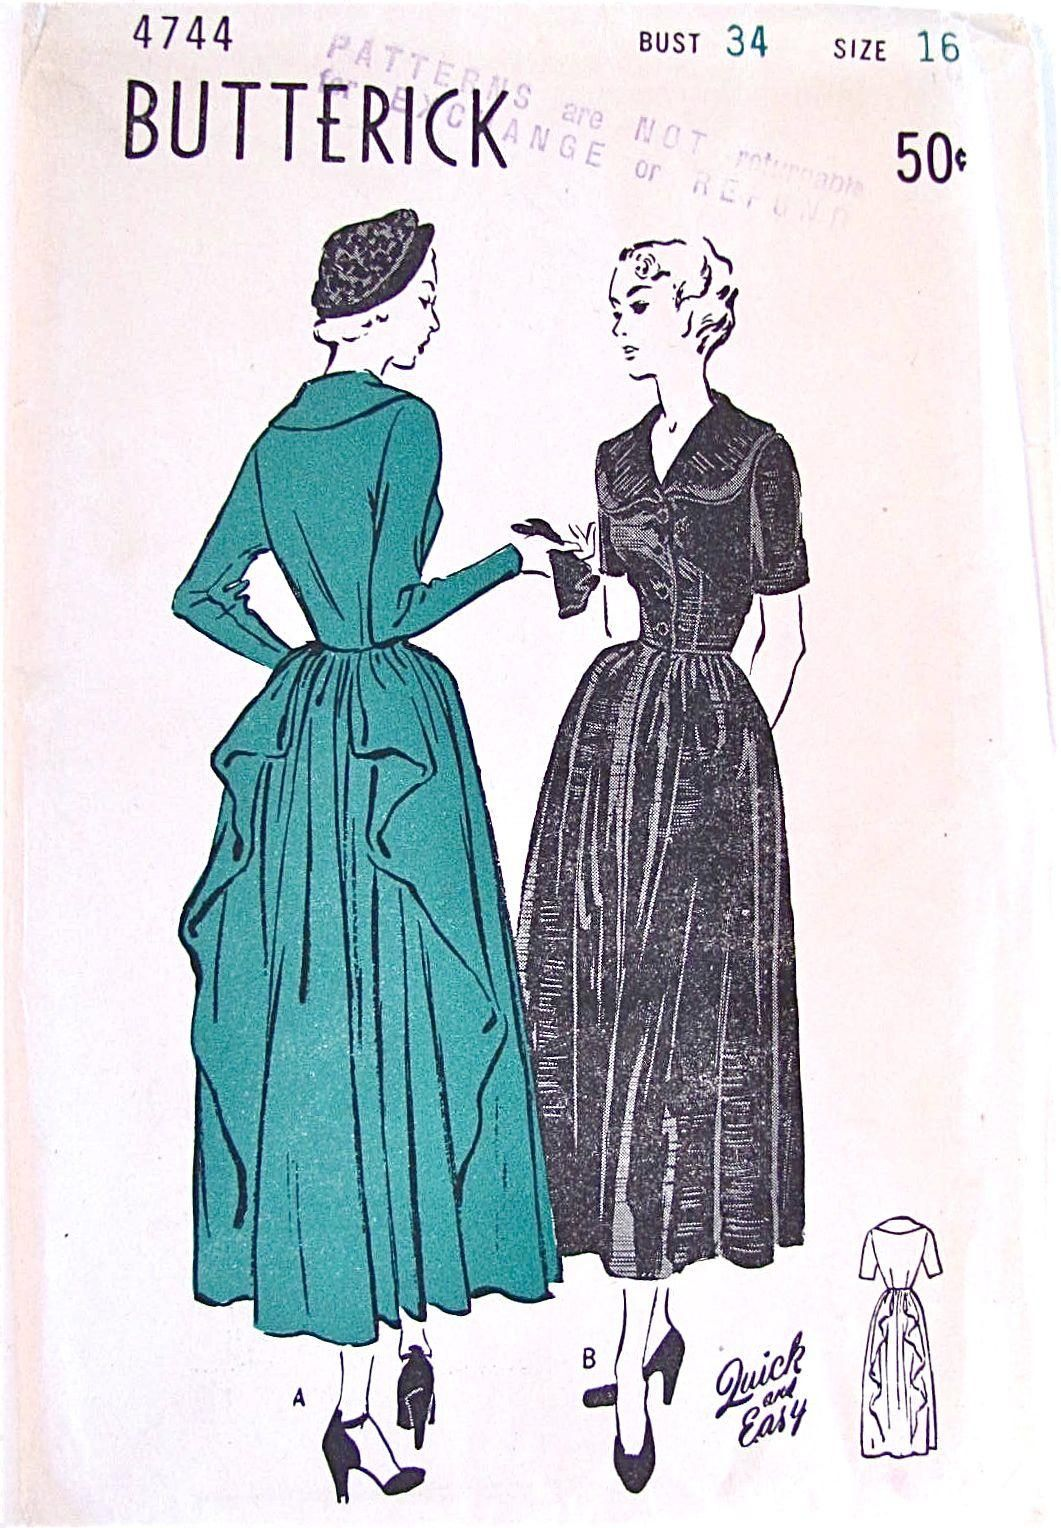 Butterick 4744 (1948) | Vintage Sewing Patterns Community Board ...